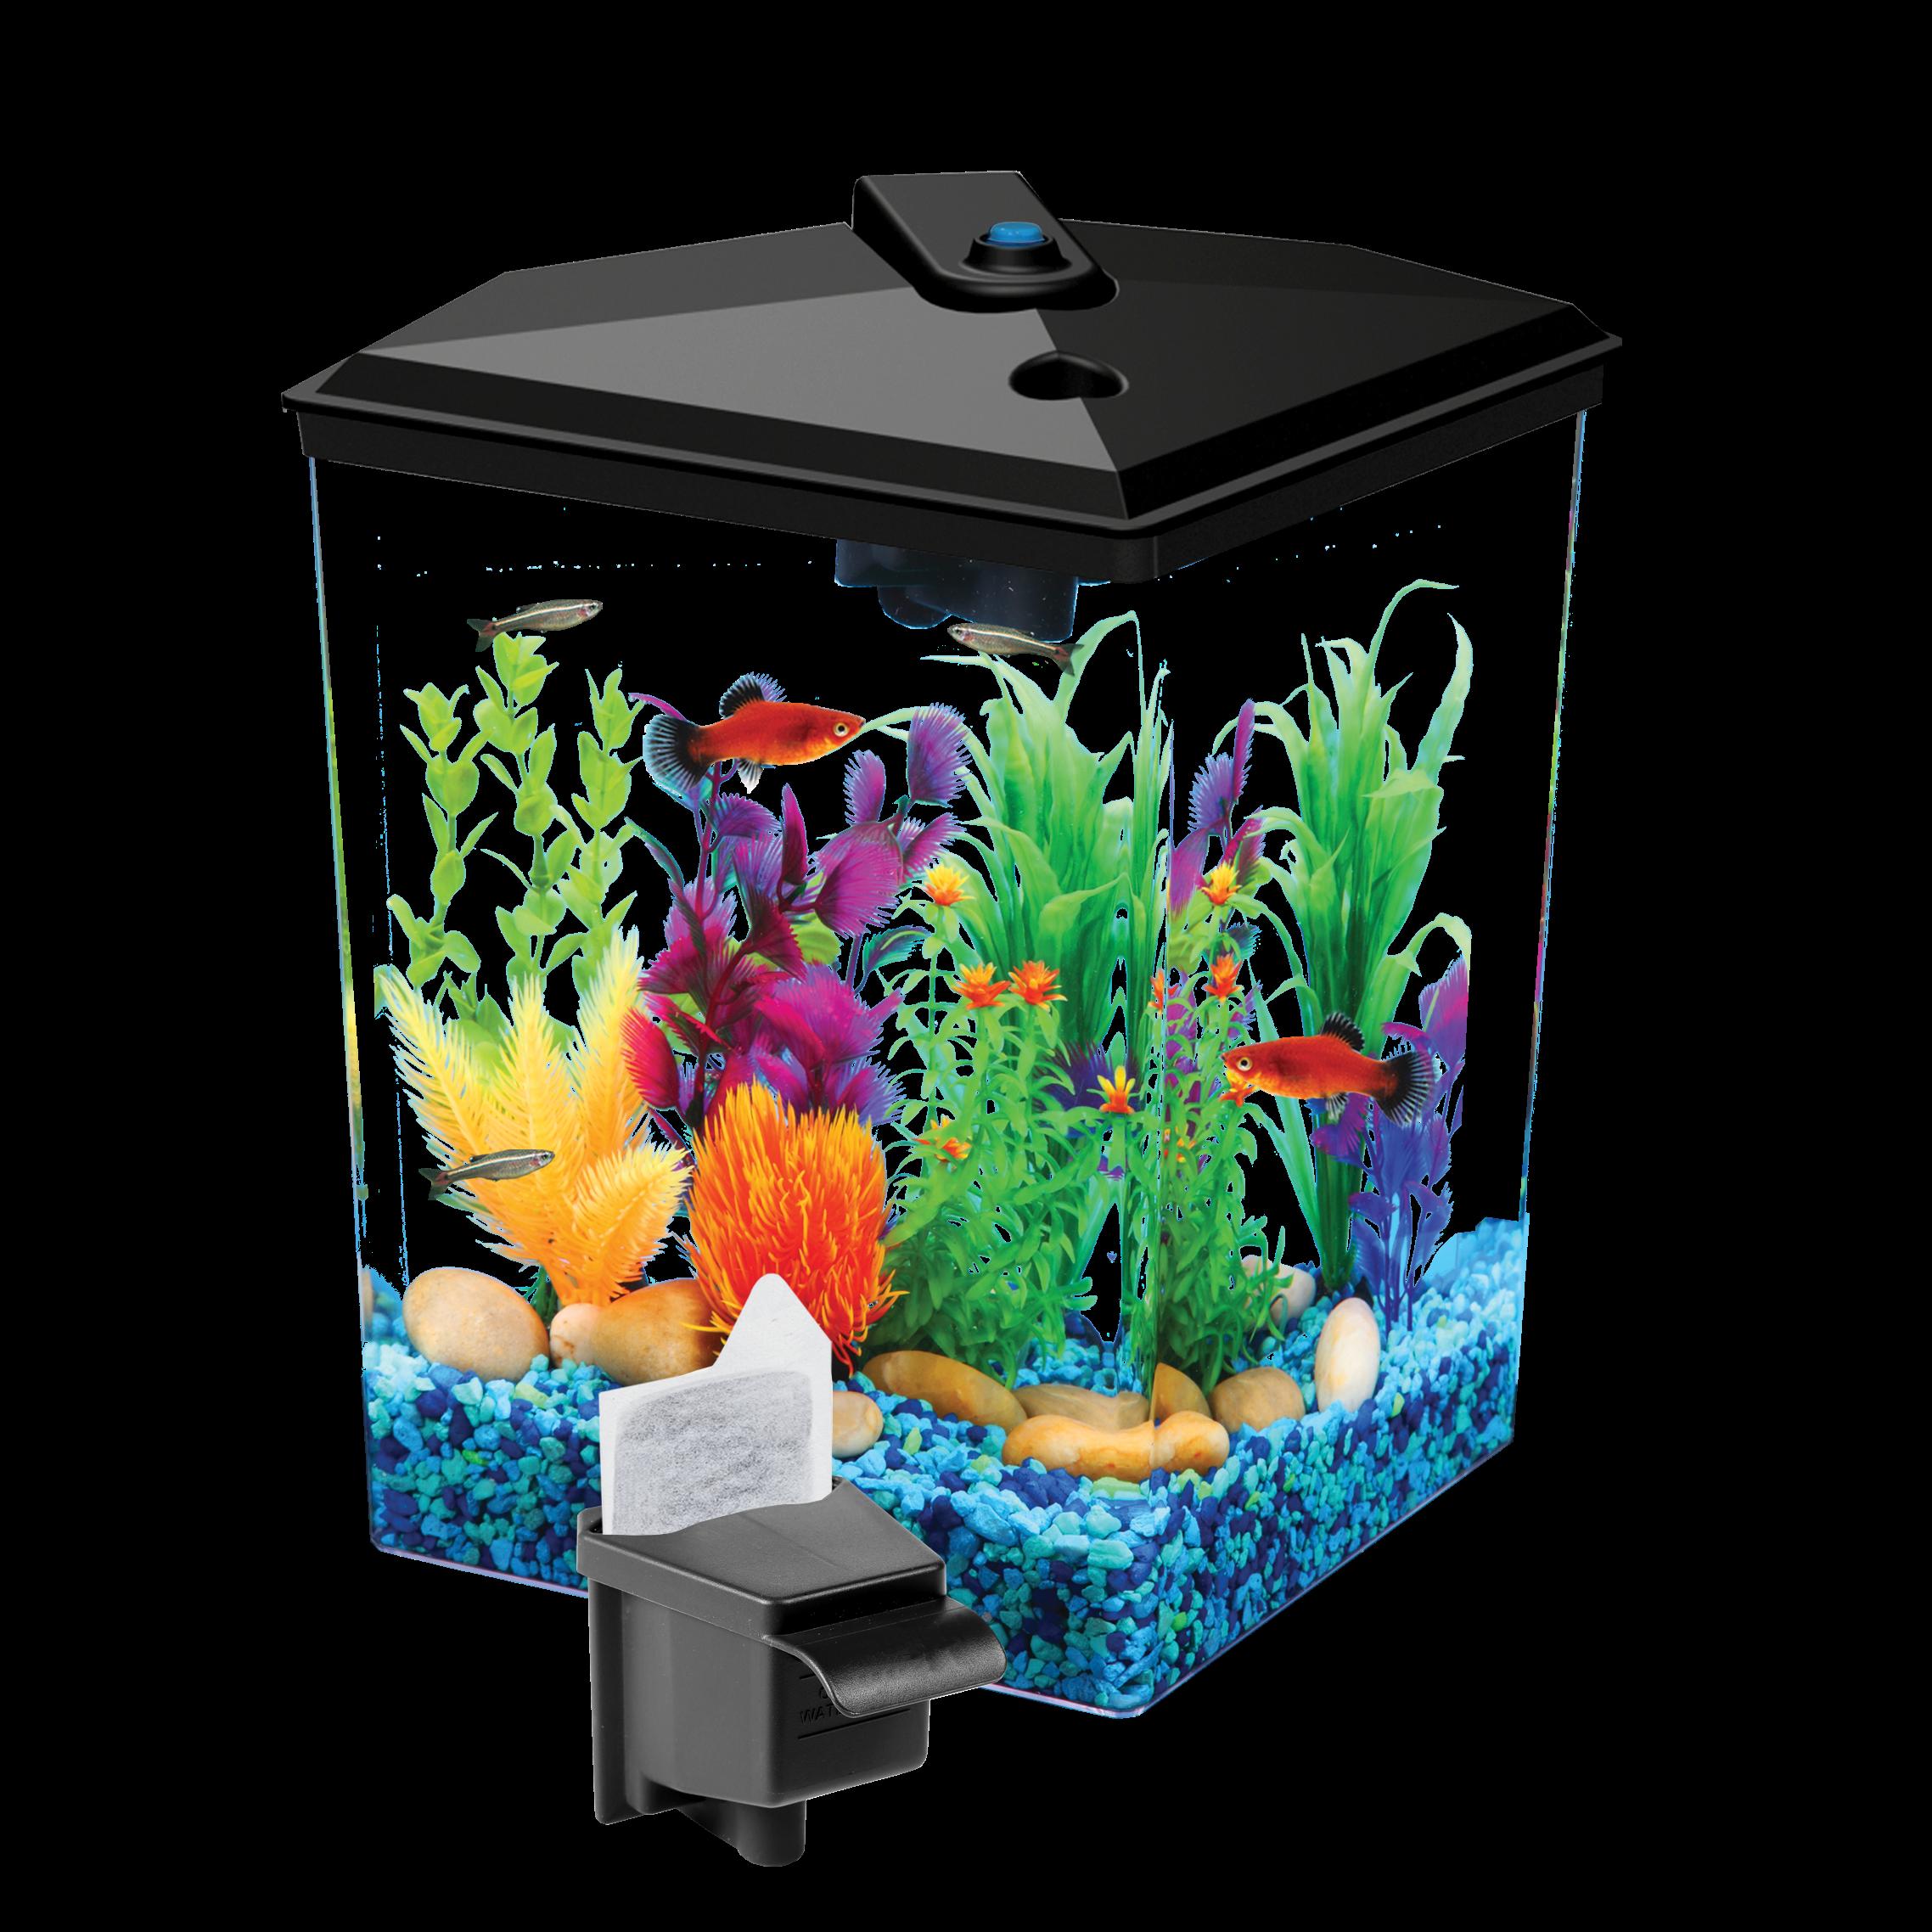 Aqua Culture 1-Gallon Aquarium Starter Kit with LED